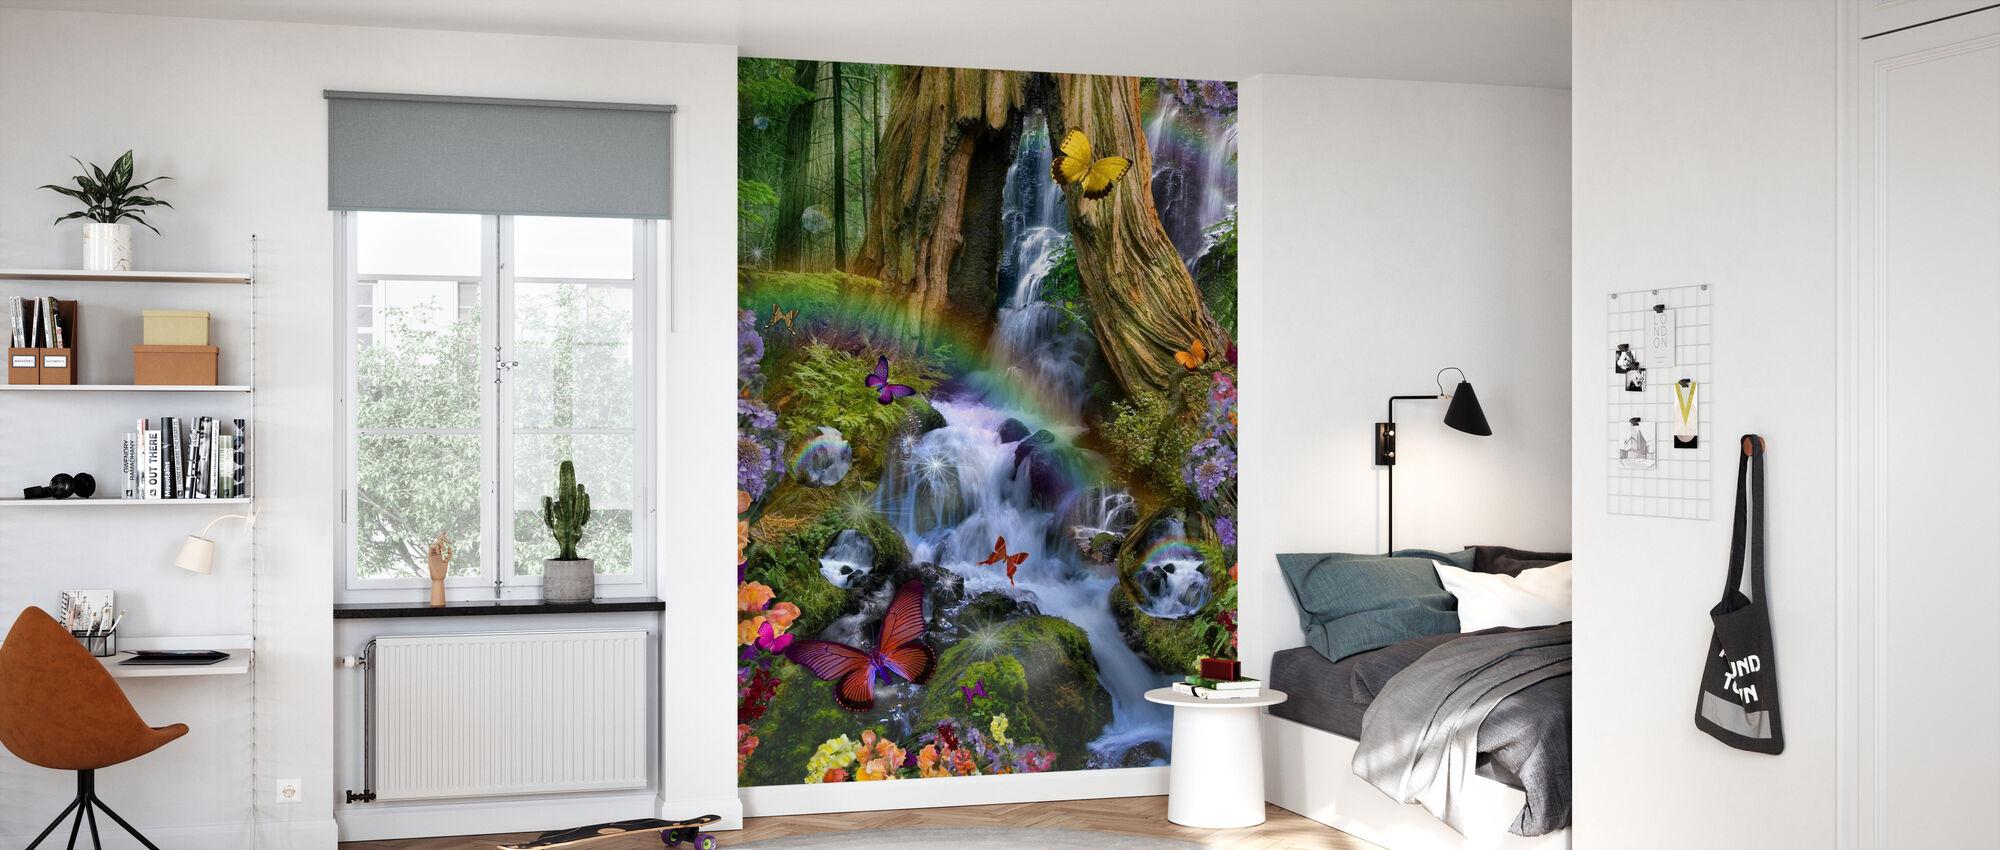 Woodland Forest Fairyland - Wallpaper - Kids Room